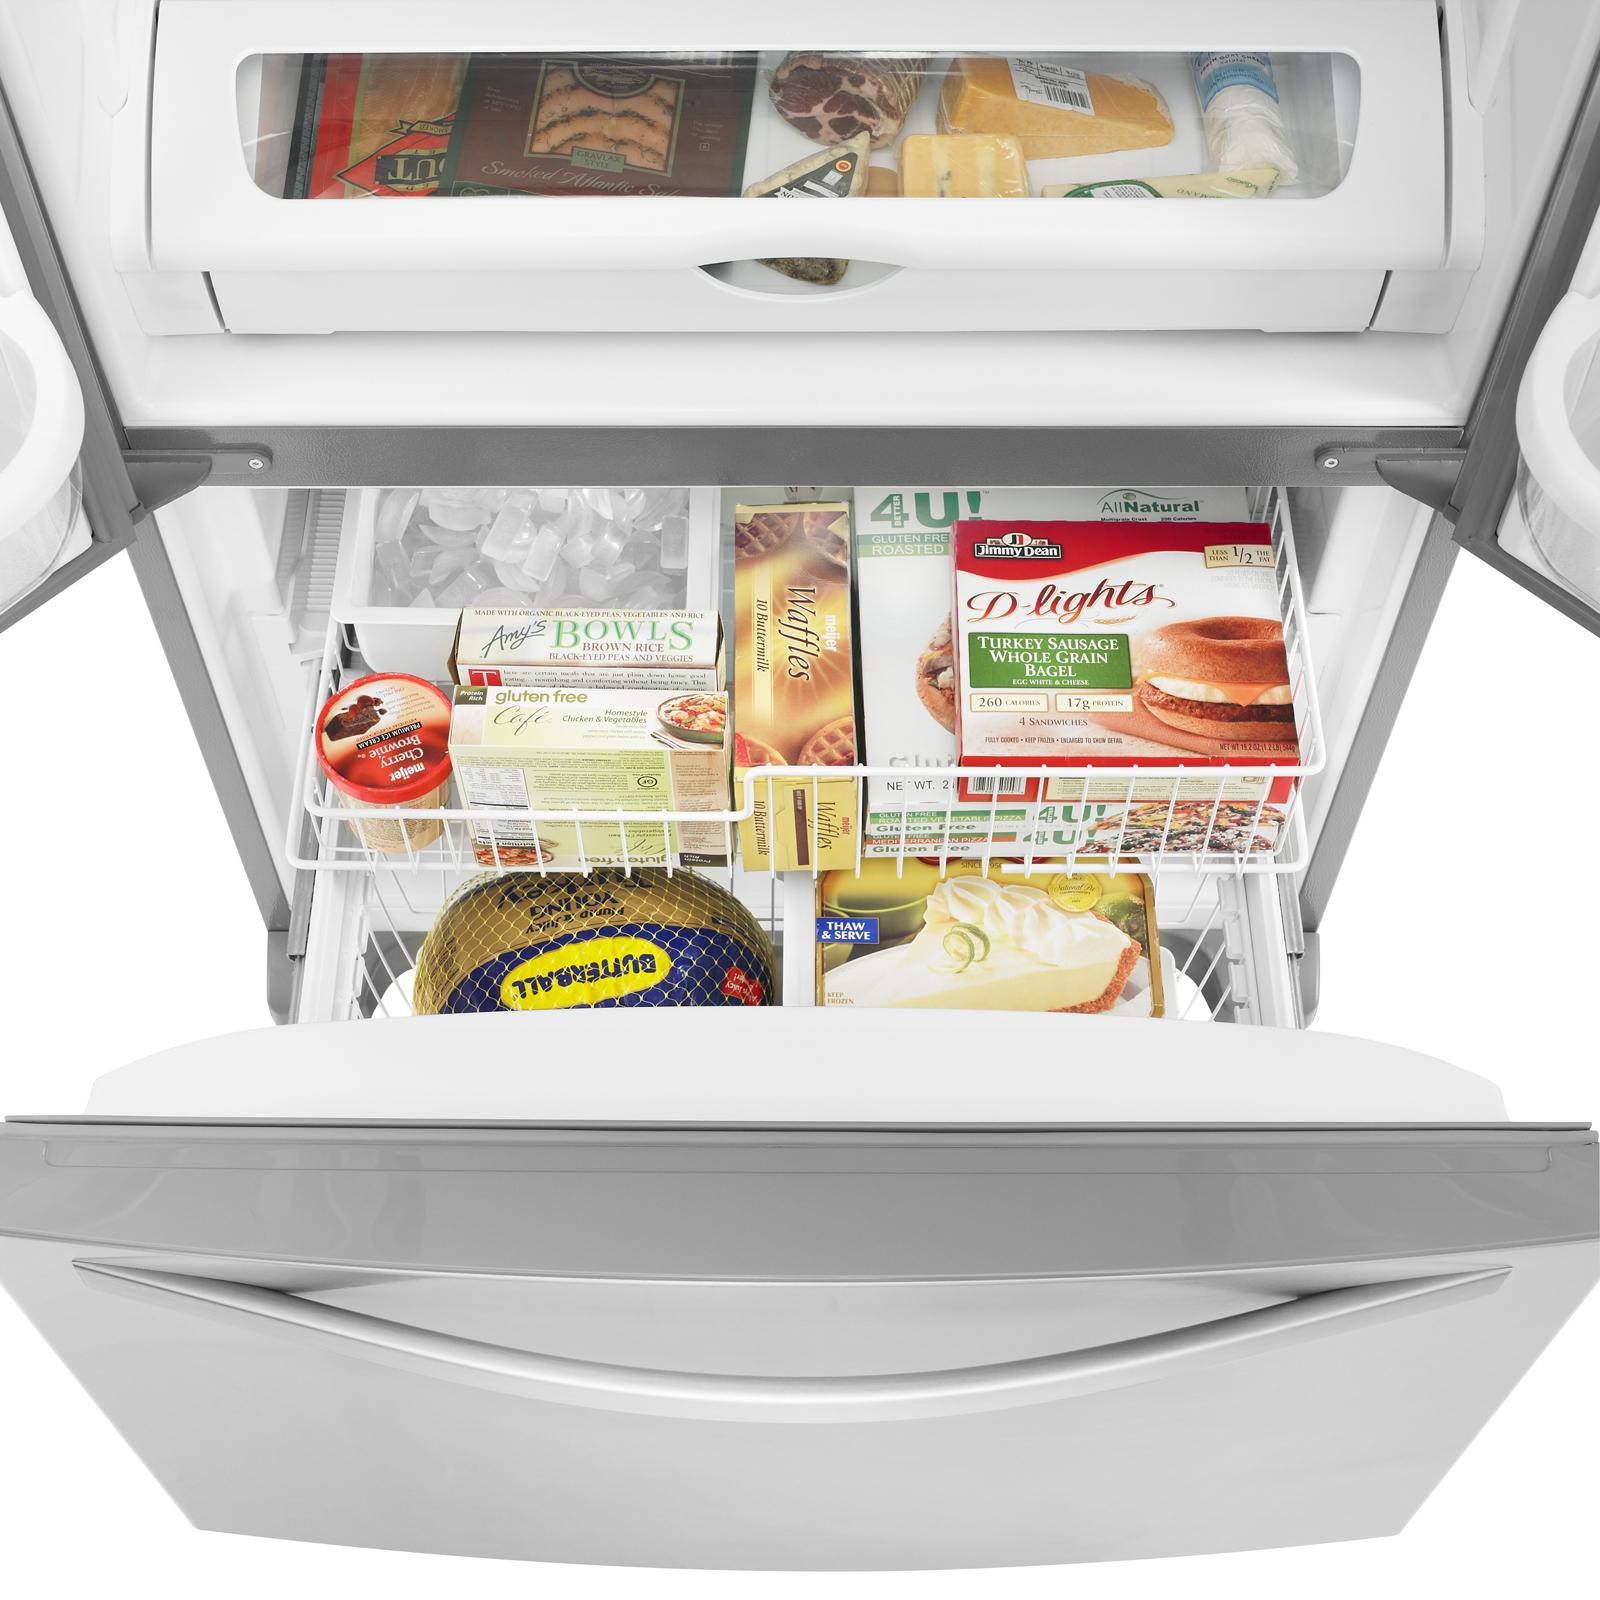 Whirlpool 22 cu. ft. French Door Bottom Freezer Refrigerator w/ Adaptive Defrost - Stainless